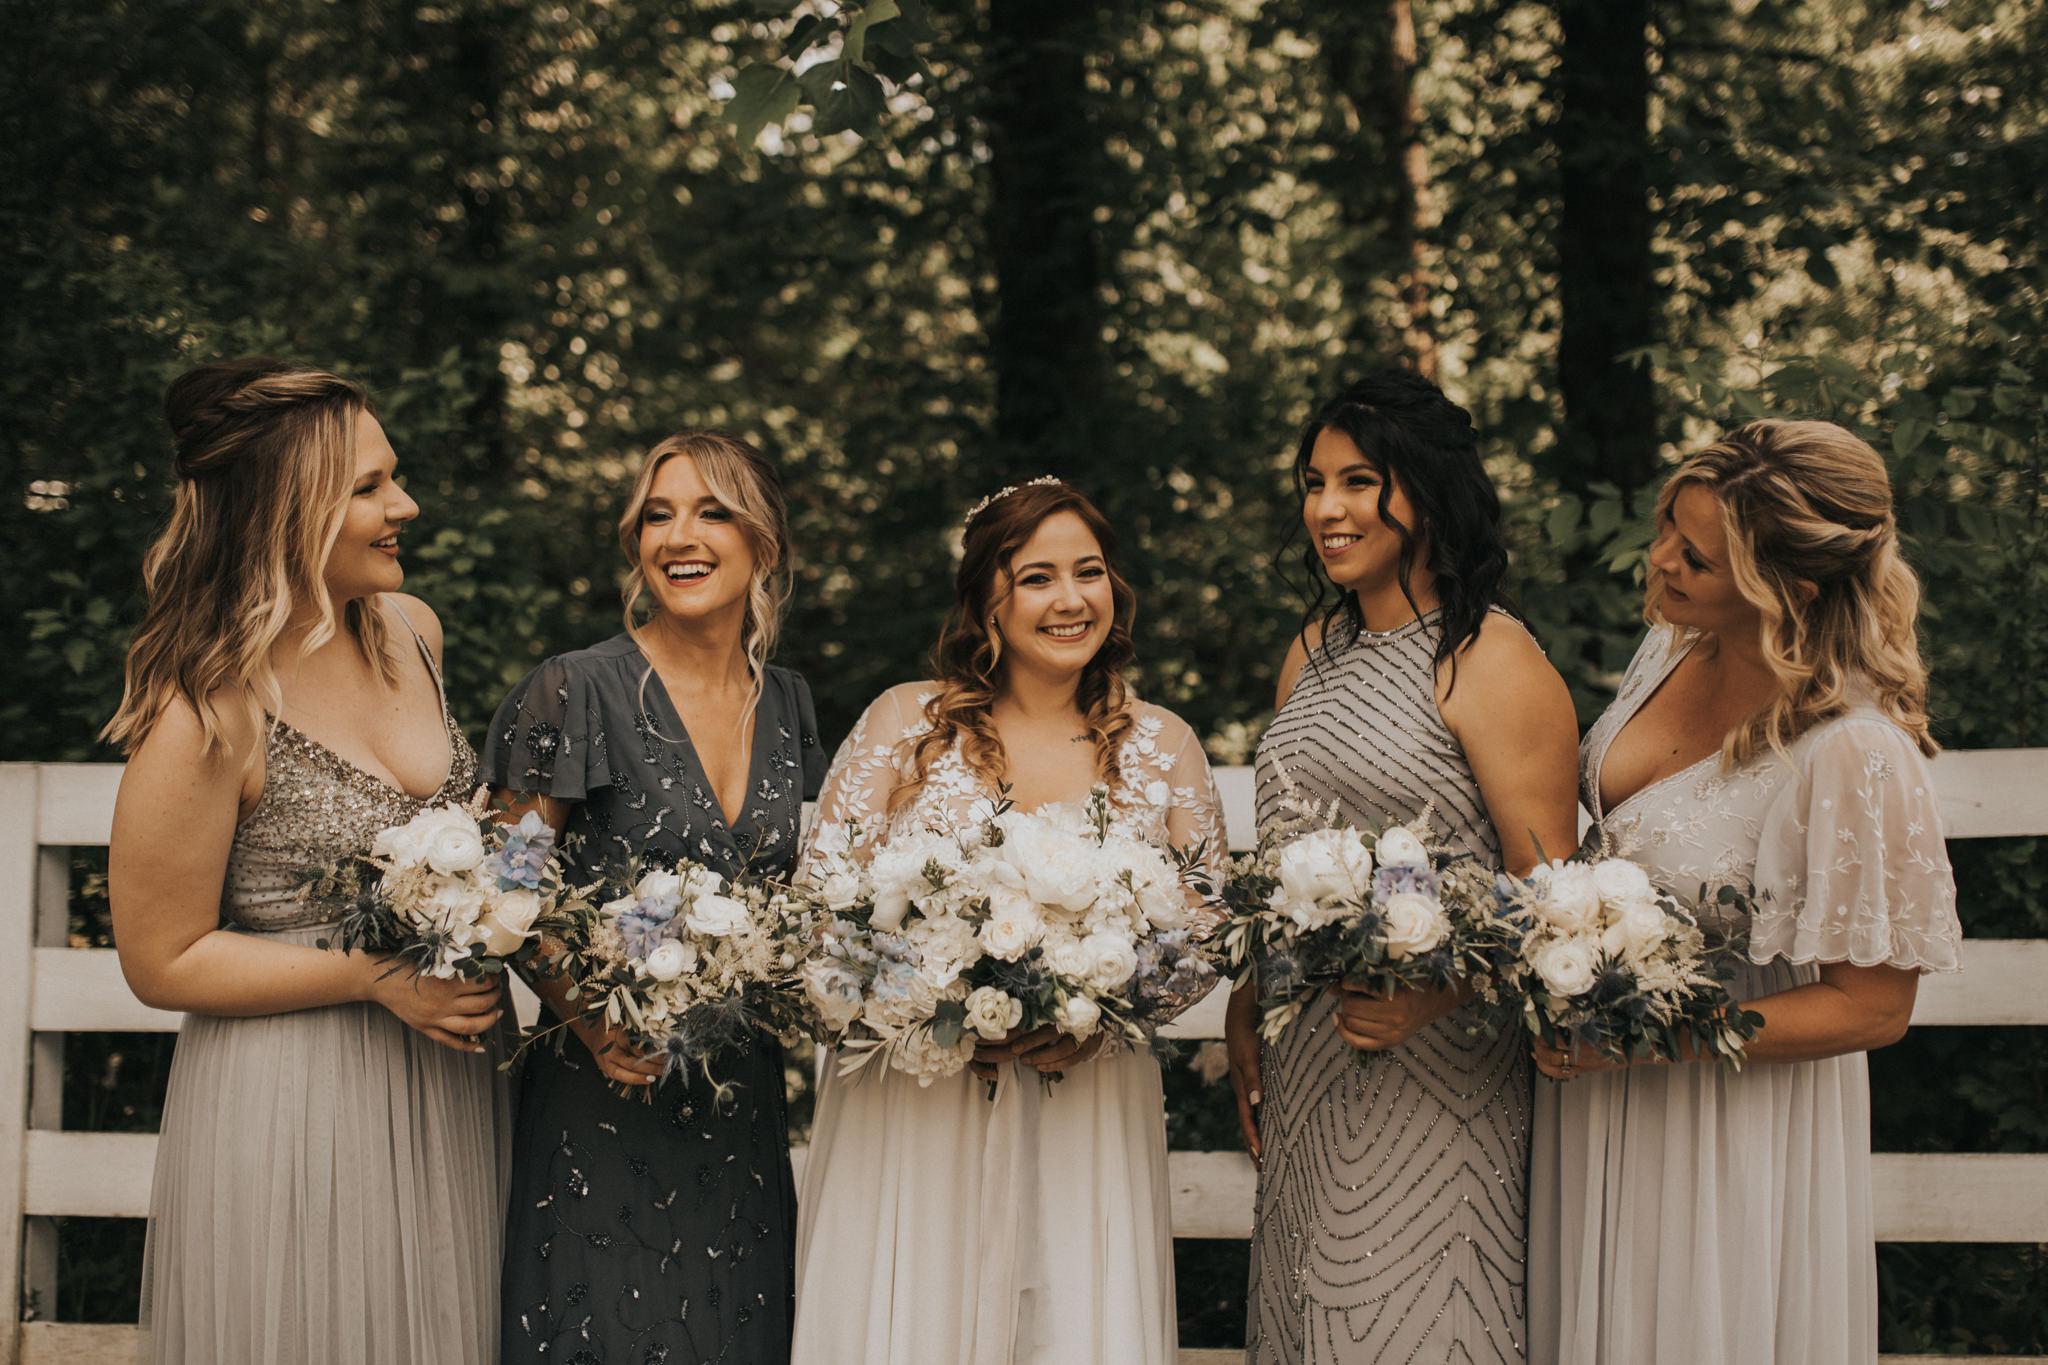 KateMatt-North-Georgia-Wedding-Photographer-Mountain-Laurel-Farm-58.jpg